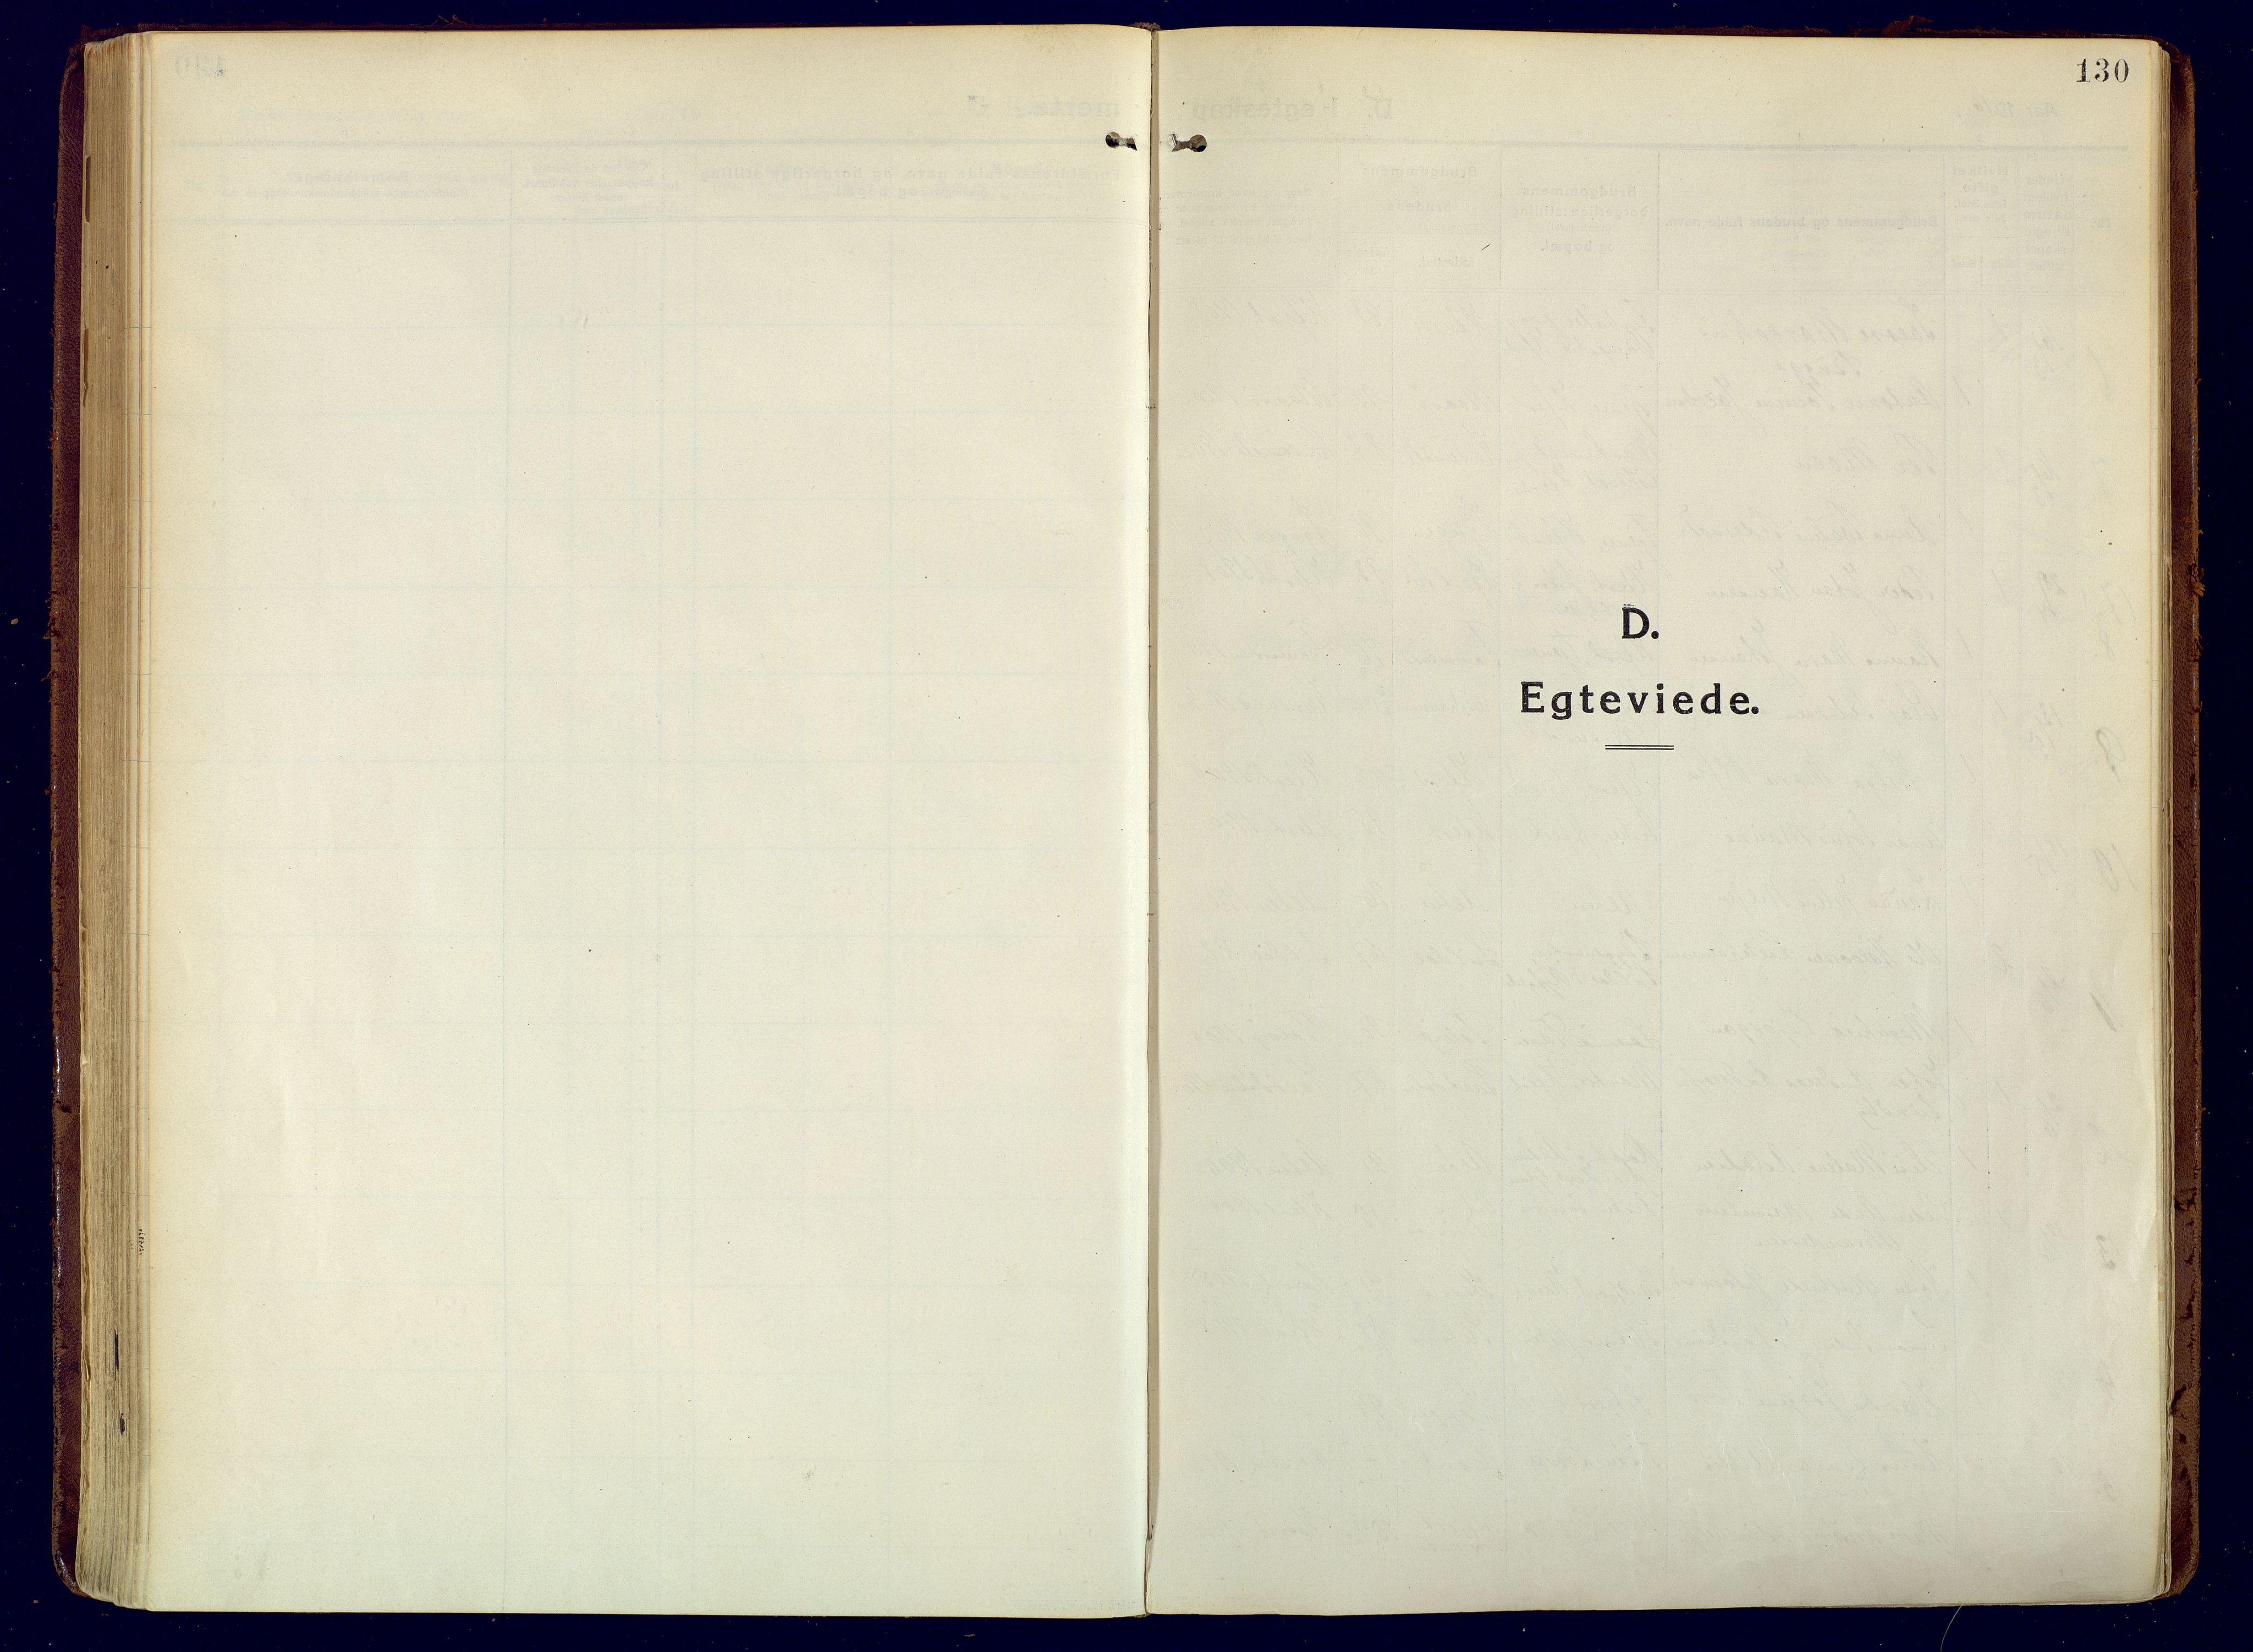 SATØ, Hammerfest sokneprestembete, Ministerialbok nr. 15, 1916-1923, s. 130